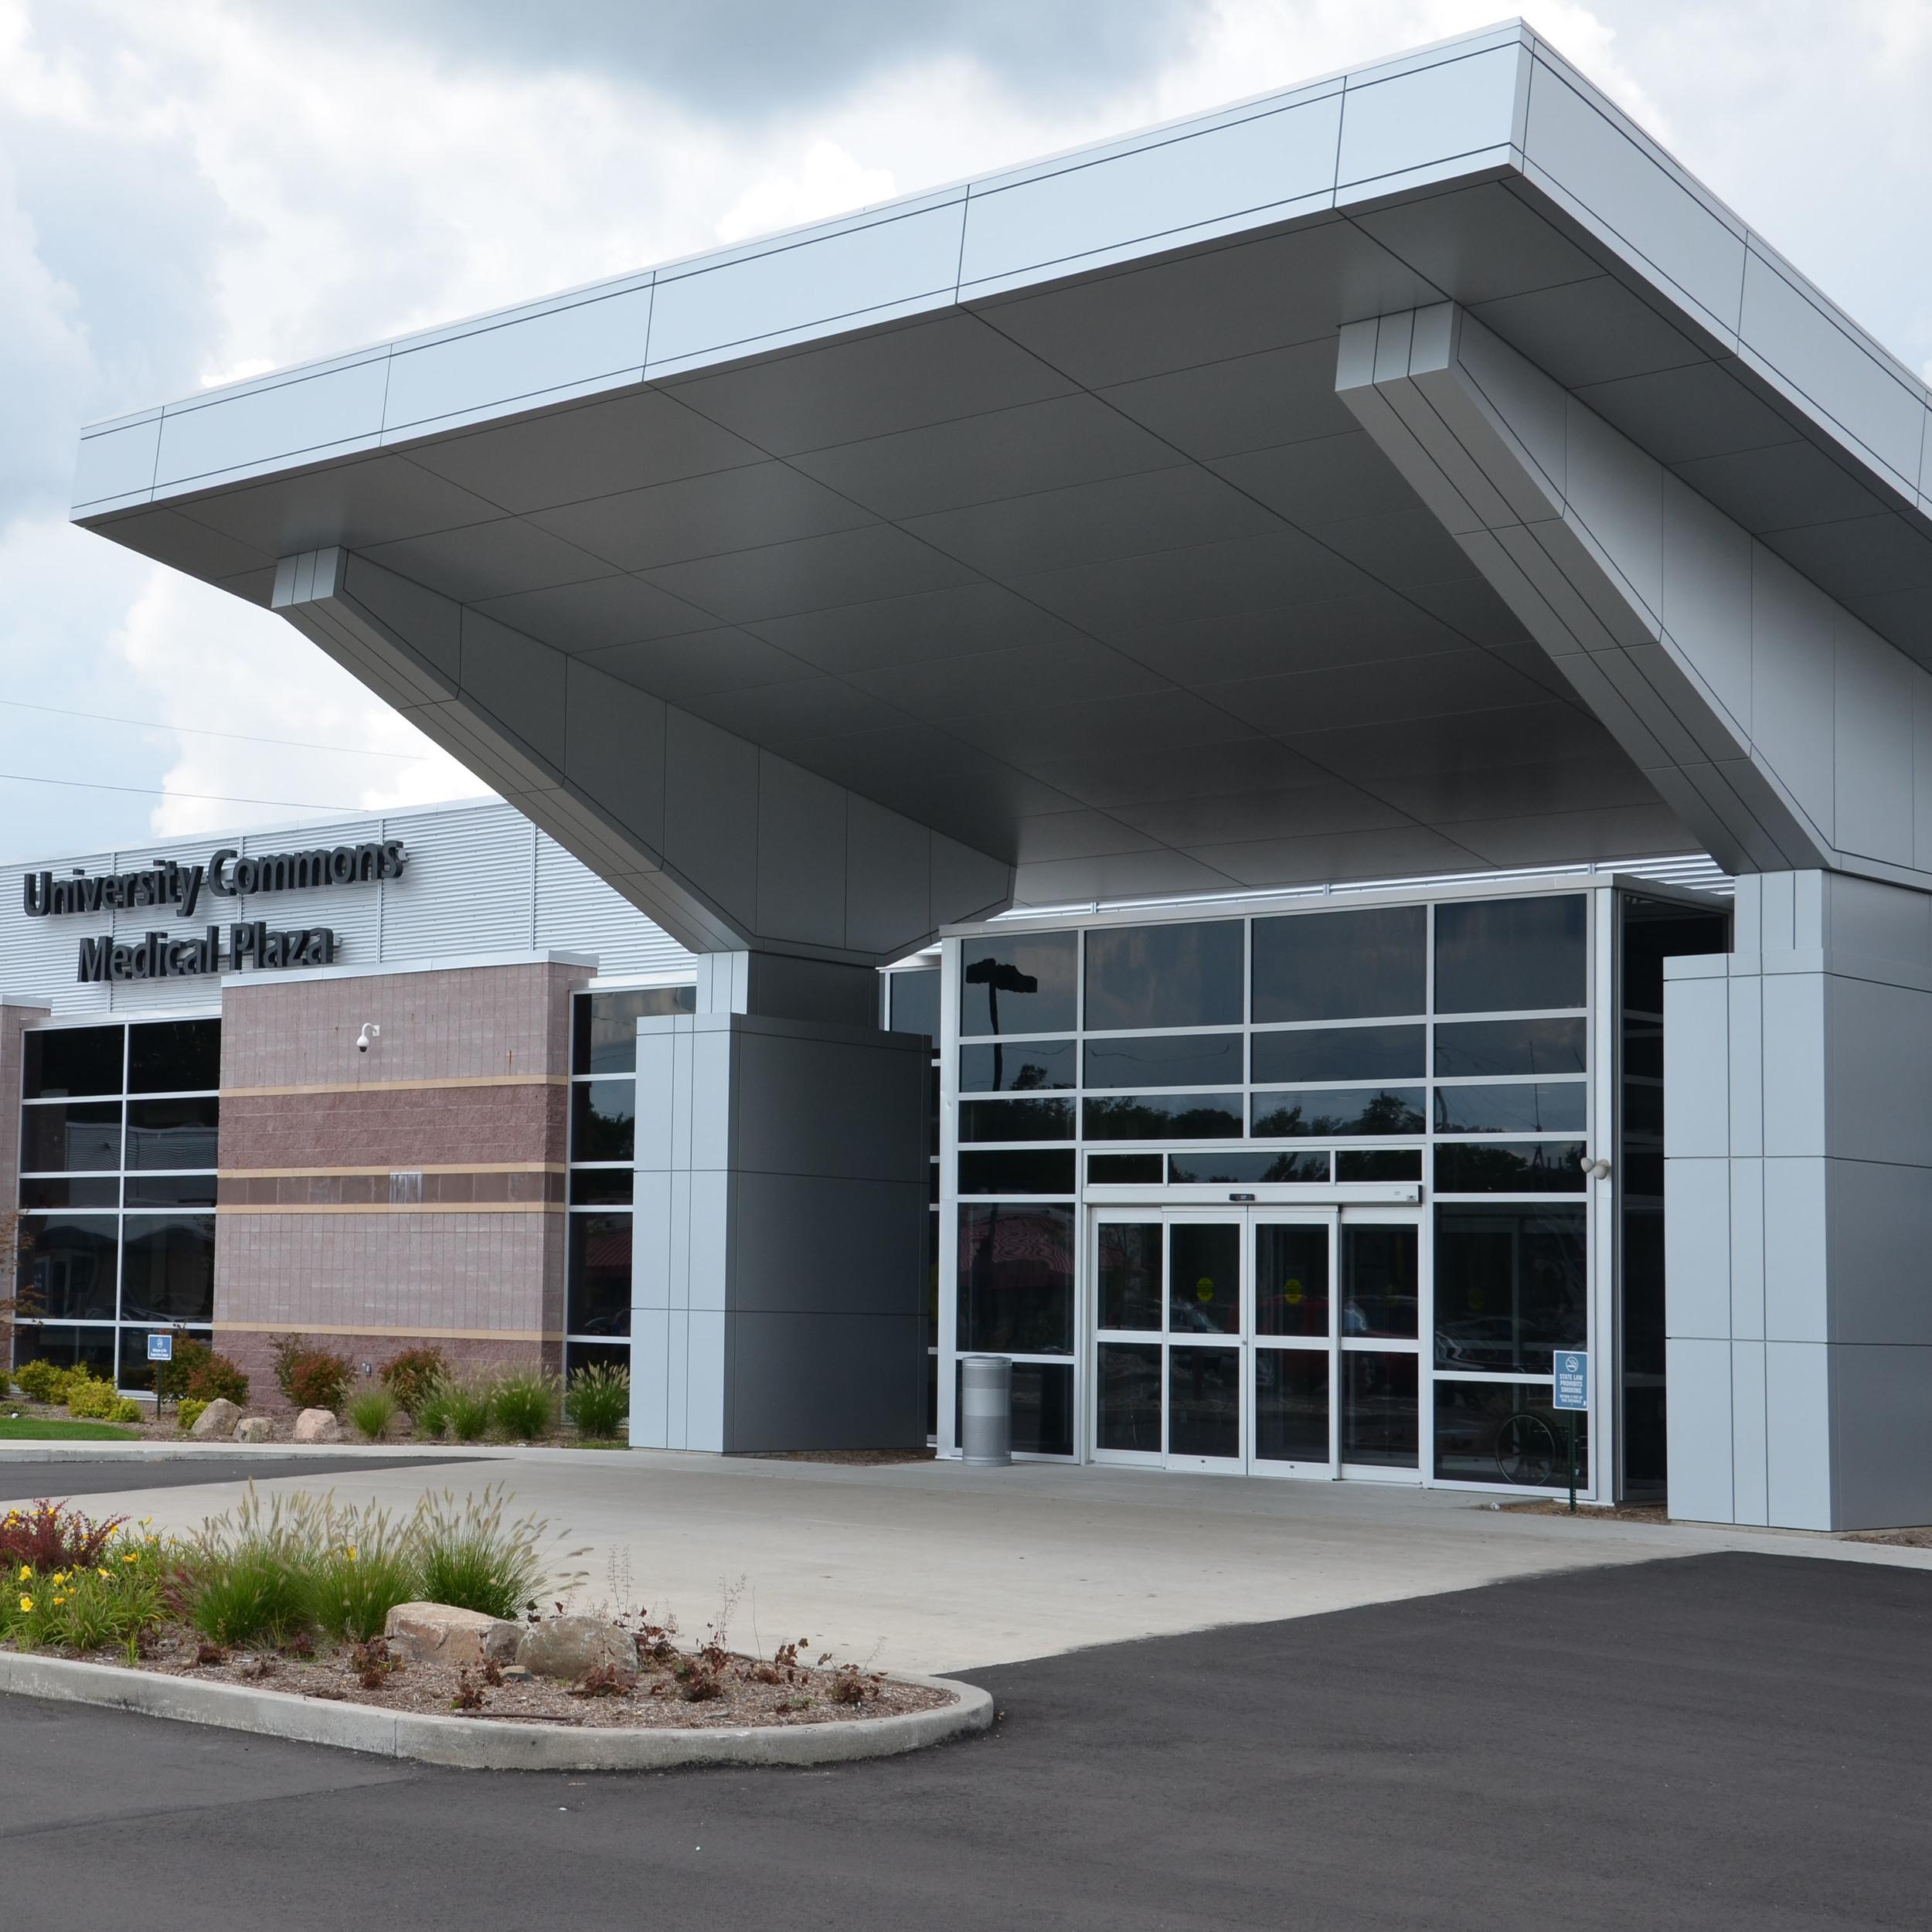 University Commons Medical Plaza